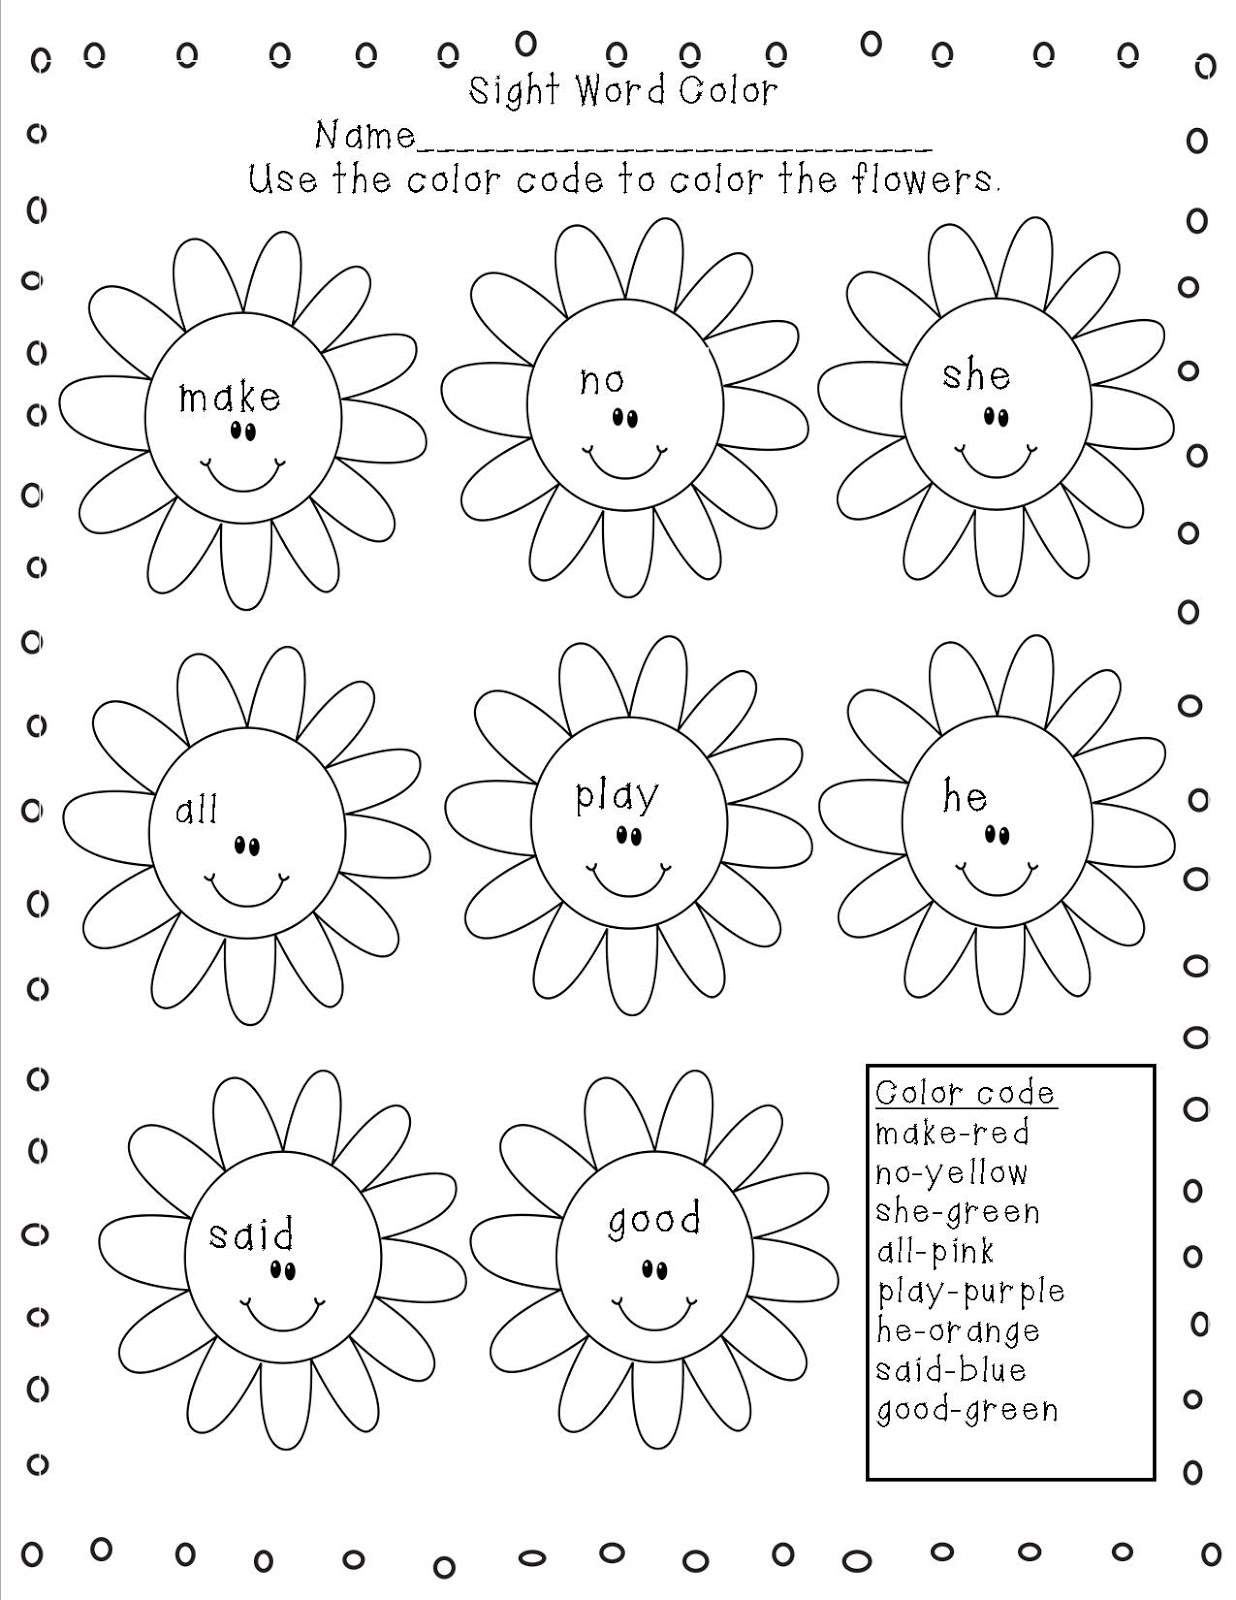 Mrs. Bohaty's Kindergarten Kingdom: February 2013